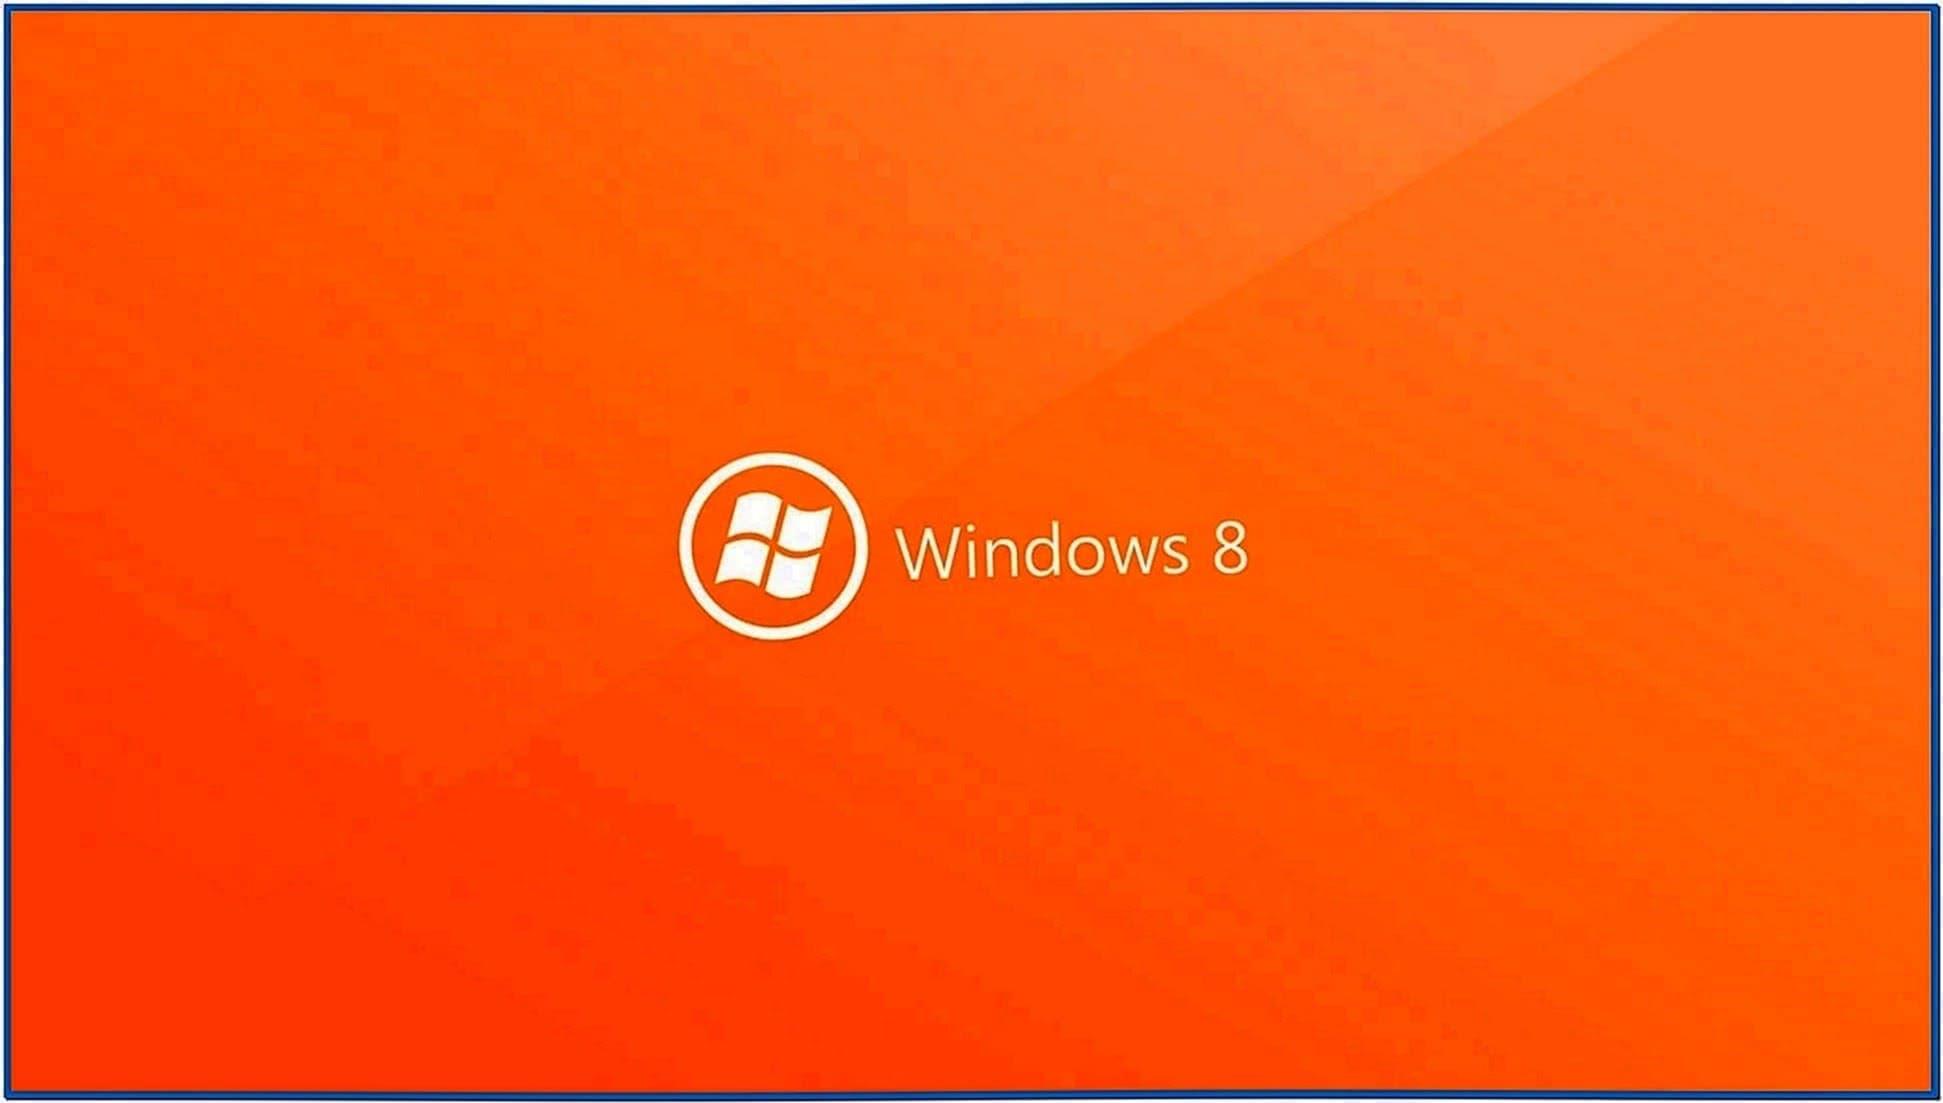 Cool Animated Screensavers Windows 8